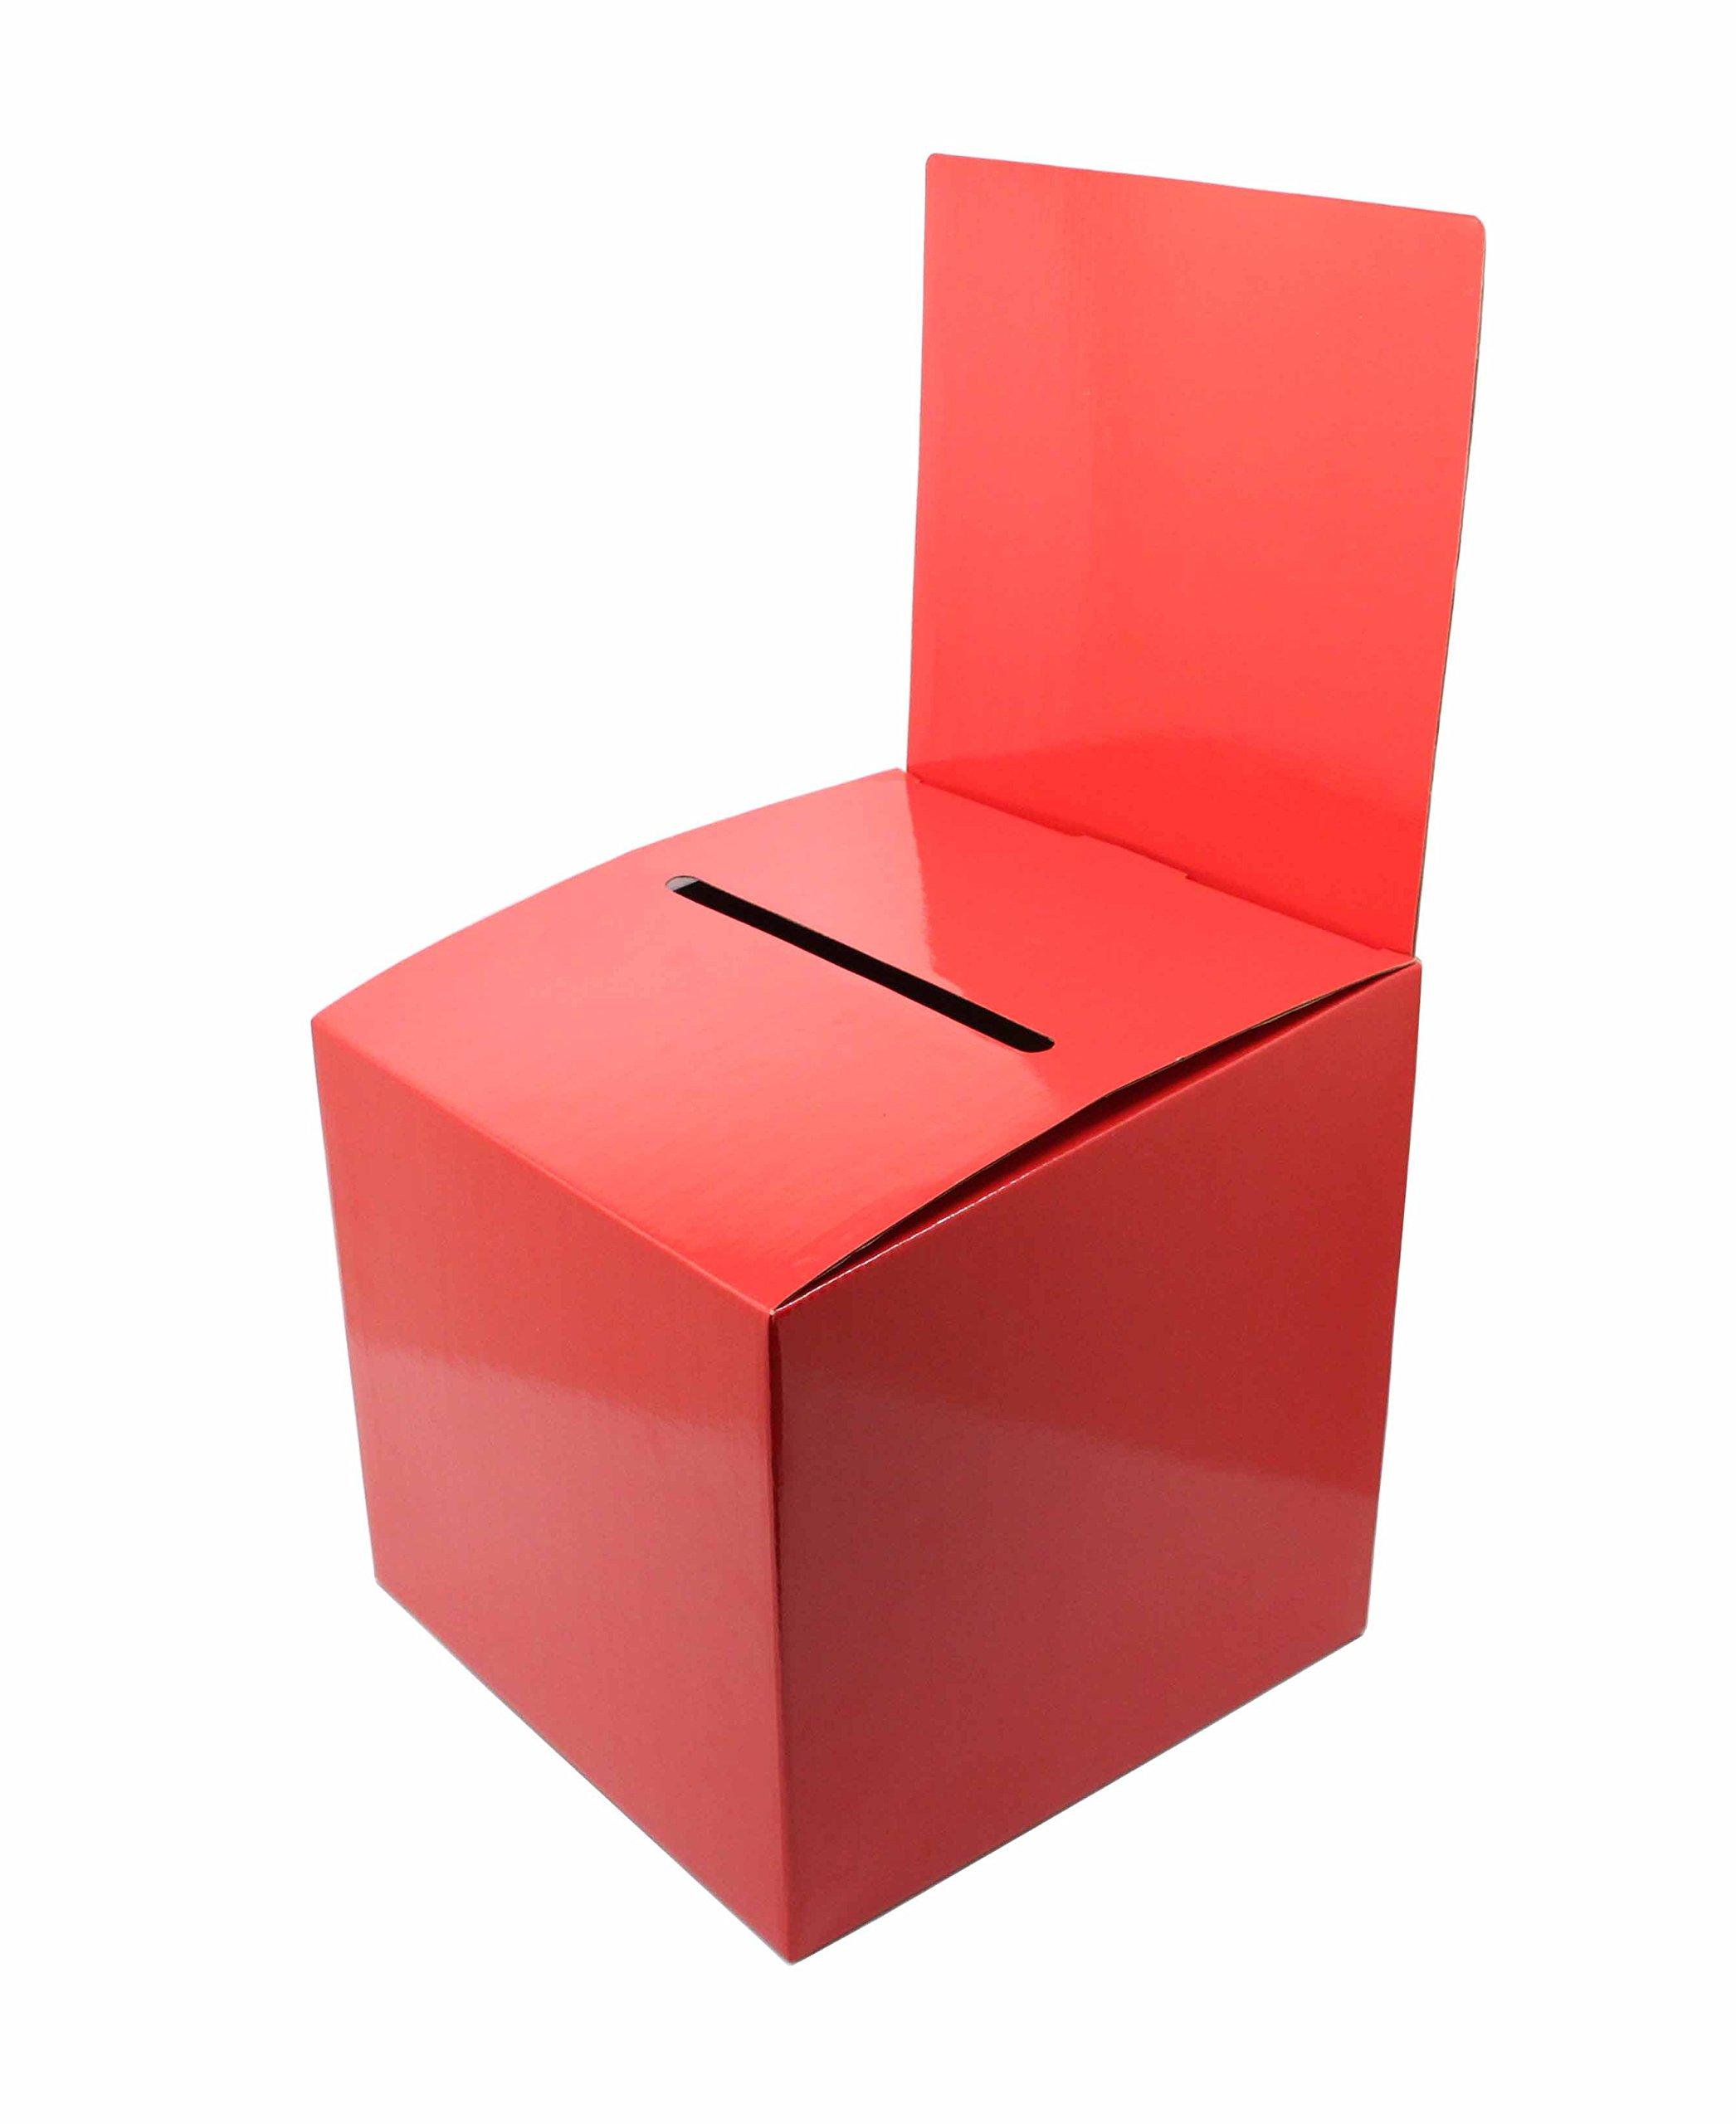 FixtureDisplays Set of 7 Cardboard Ballot Box with Removable Header, Slanted Top - Red 119615-7PK